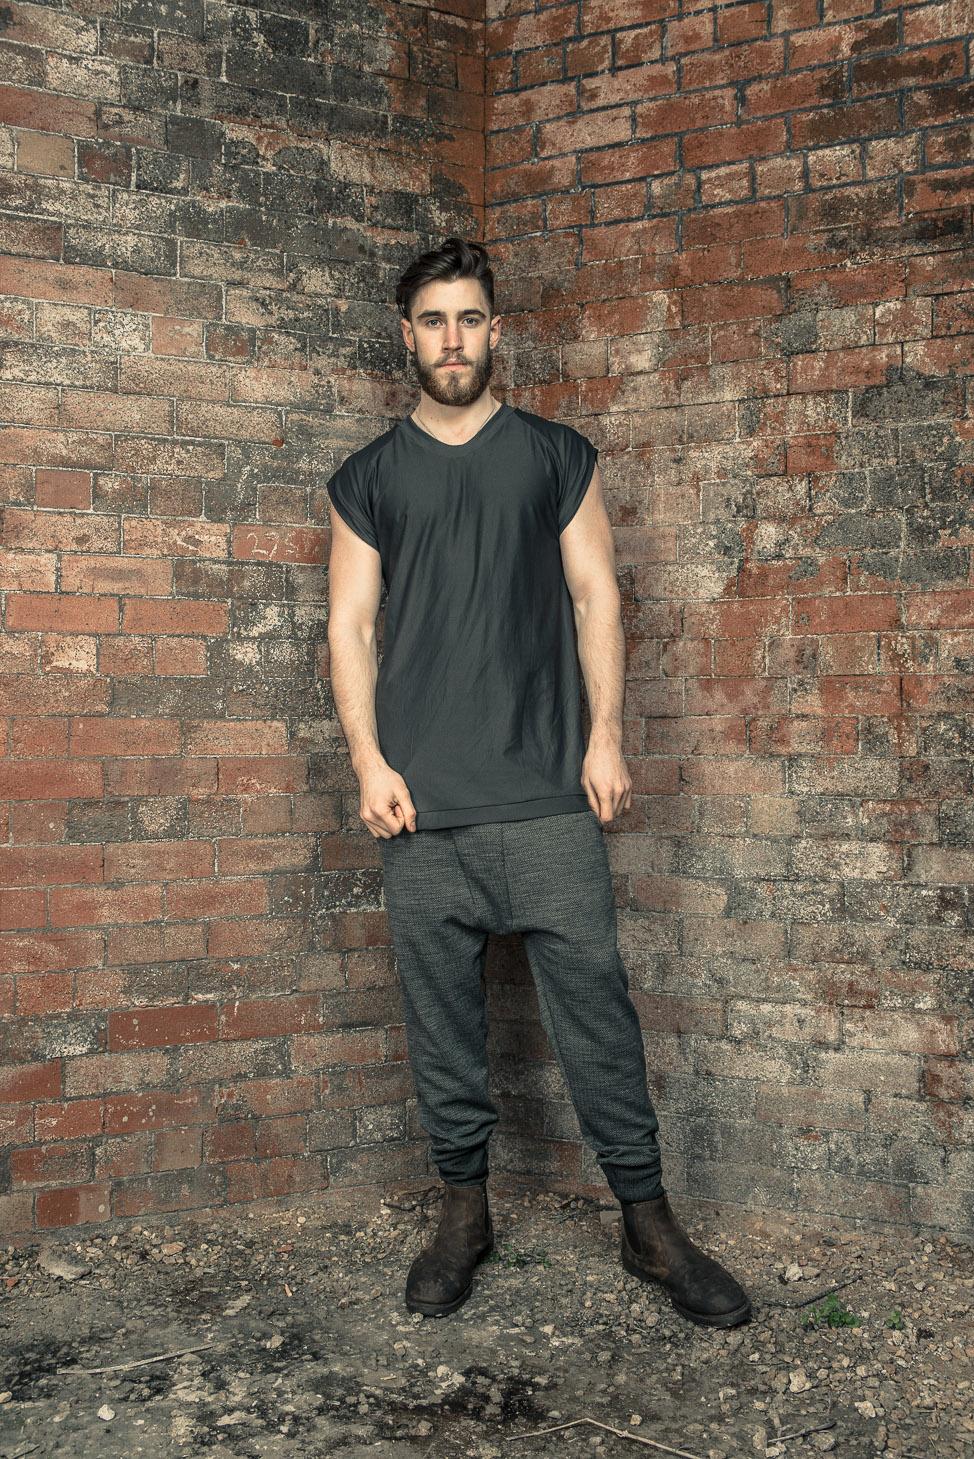 zaramia-ava-zaramiaava-leeds-fashion-designer-ethical-sustainable-tailored-minimalist-mesh-oversized-nishi-raglan-versatile-drape-grey-tshirt-top-vest-hareem-trousers-black-grey-texture-styling-3.jpg